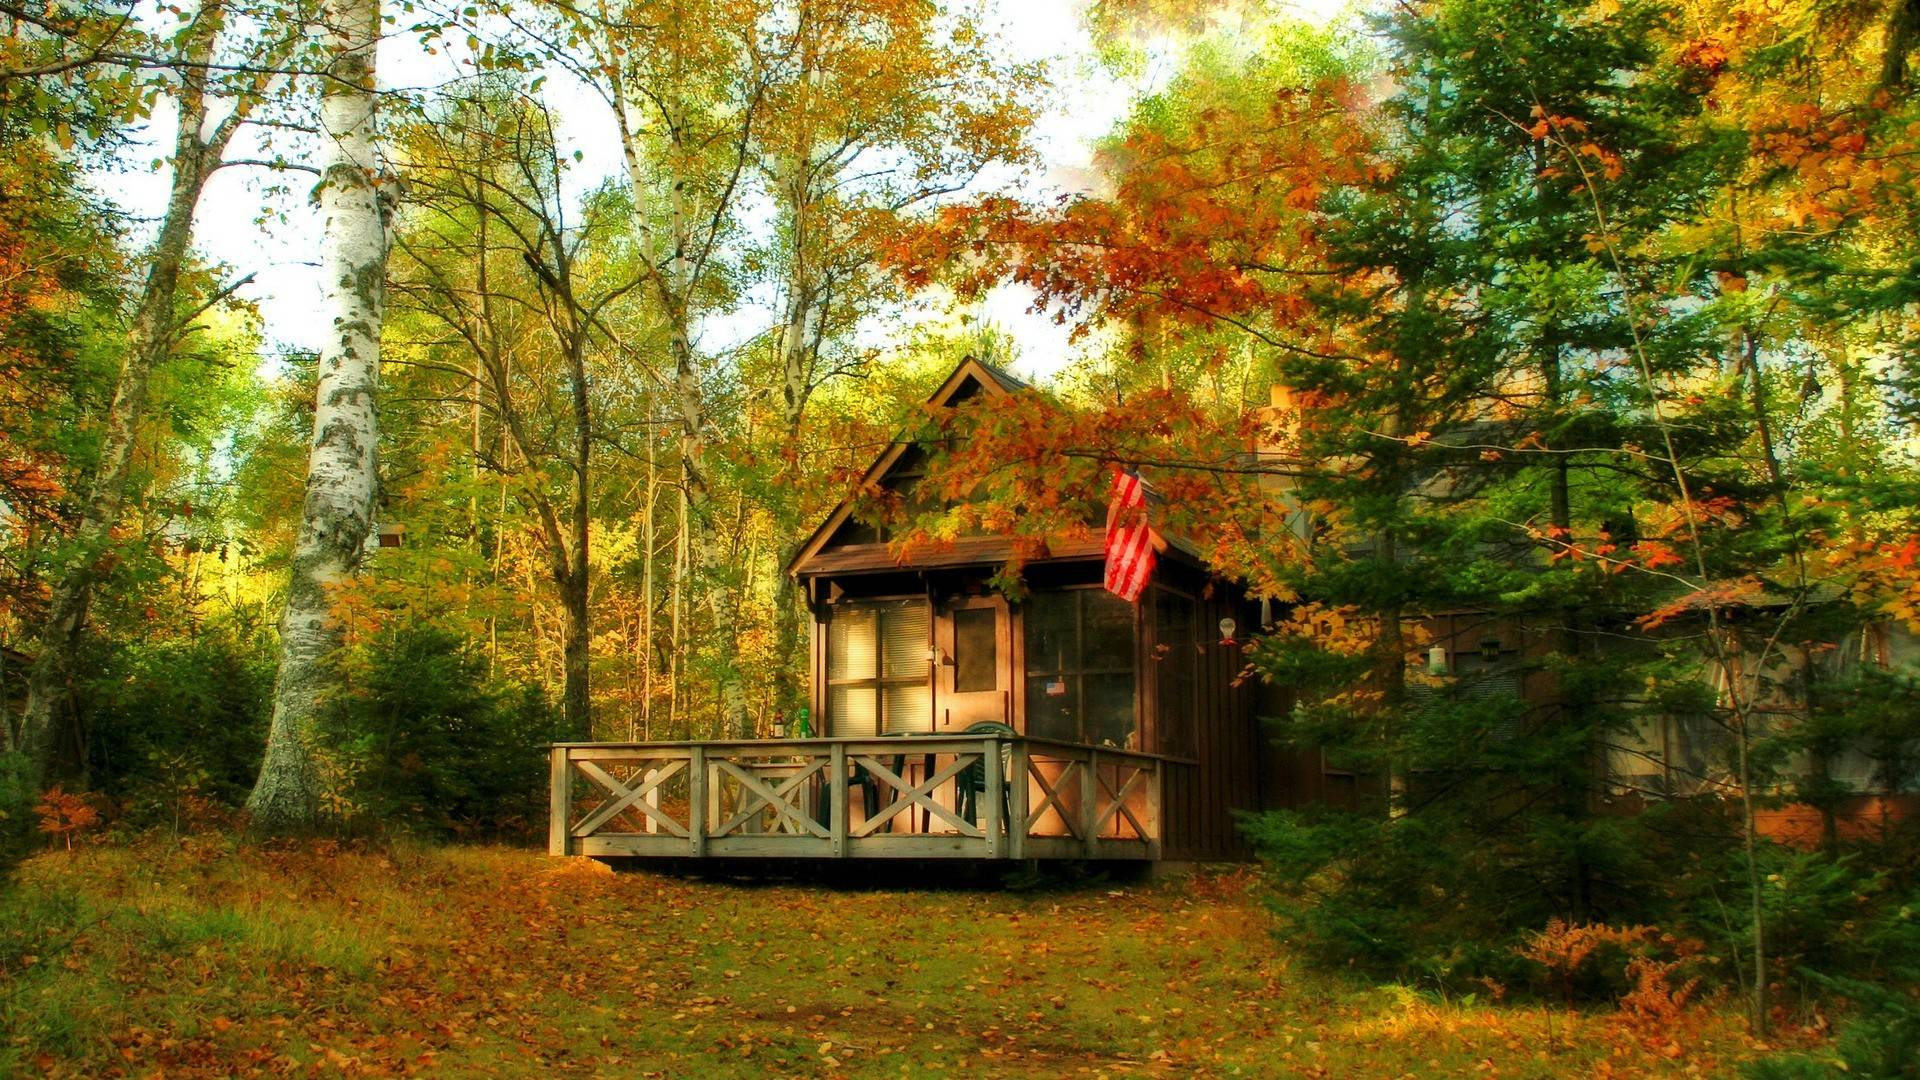 Fall Cabin The Woods Wallpaper Free Download Cottage Wallpaper Pixelstalk Net